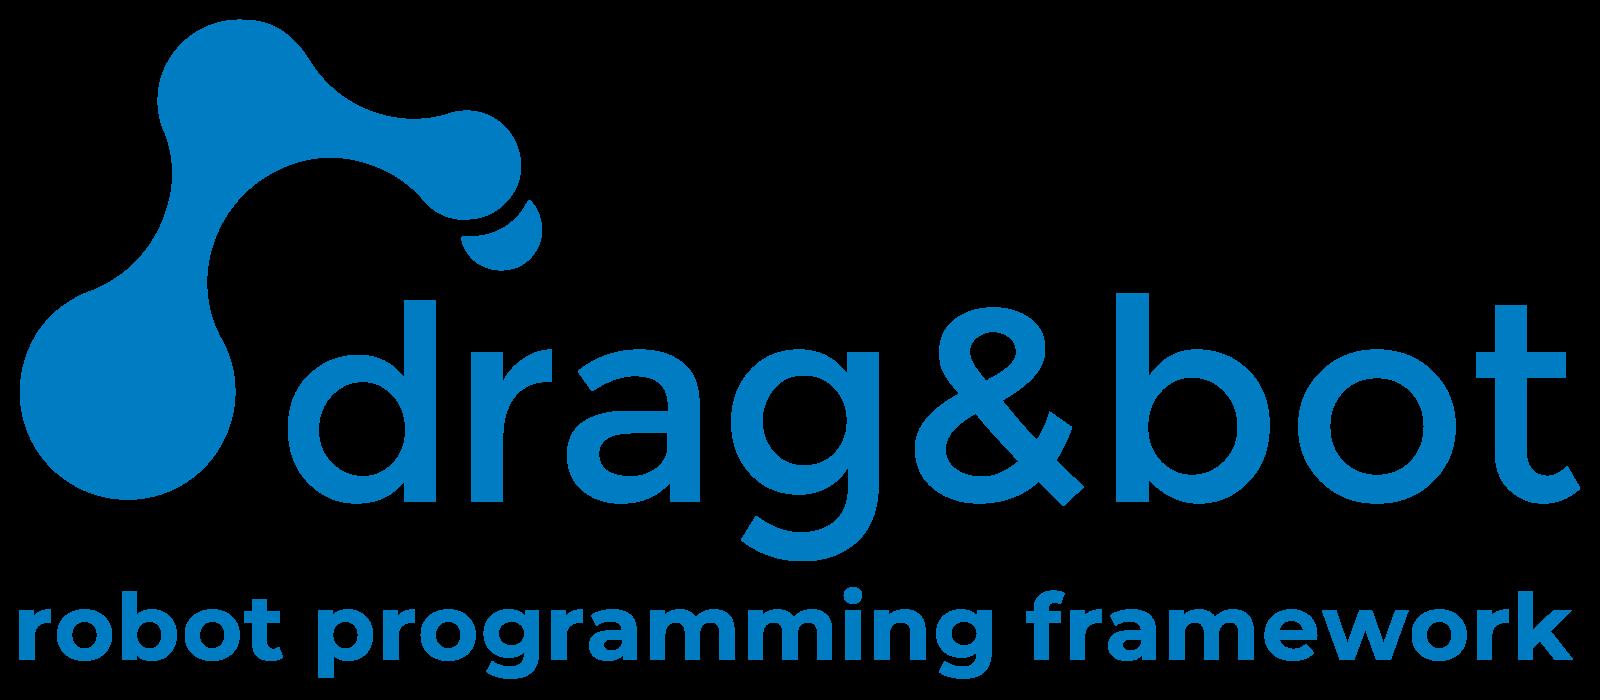 Drag and Bot